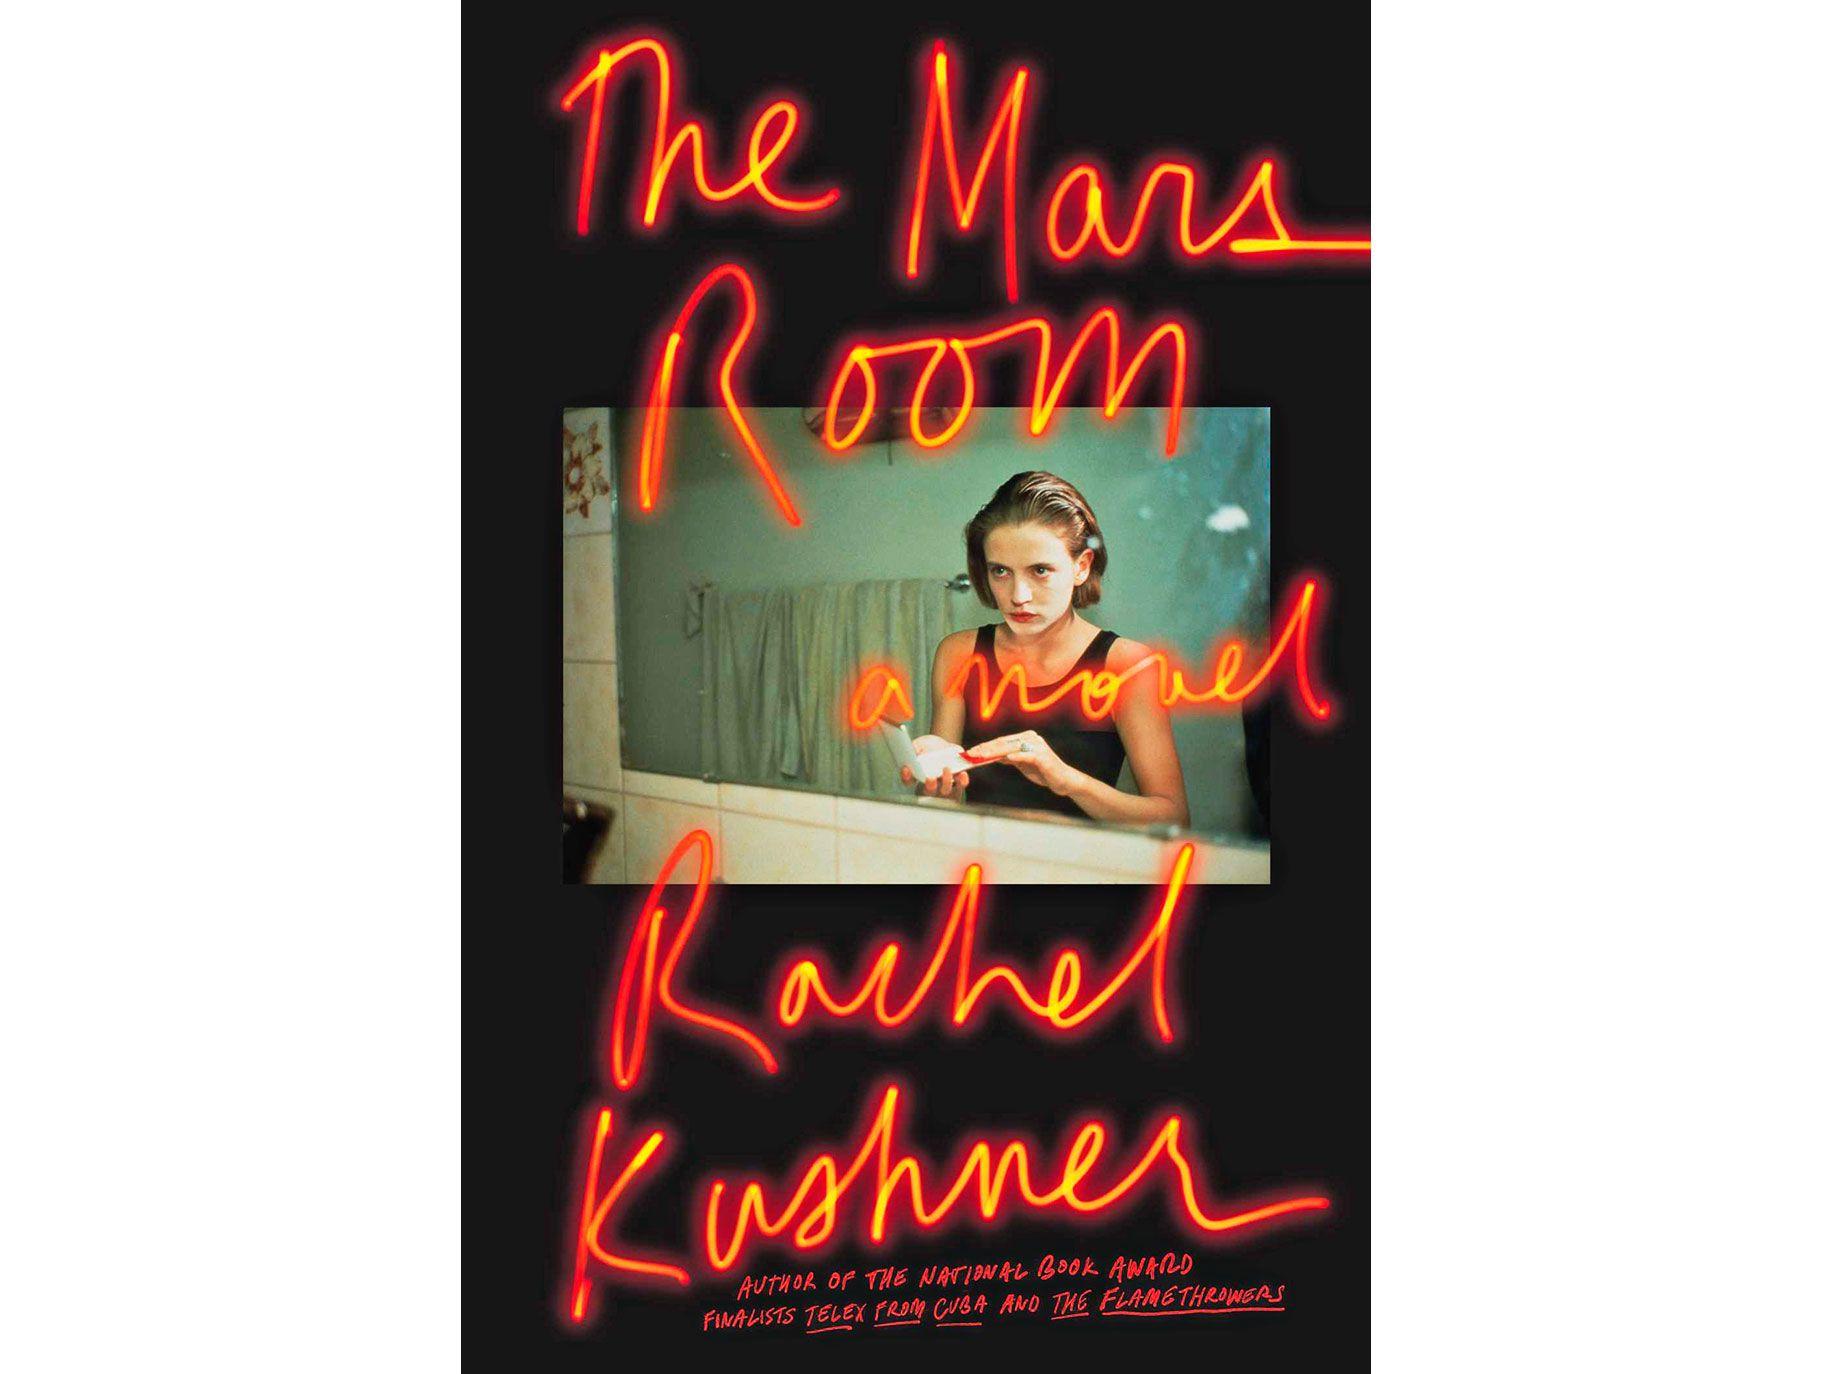 """The Mars Room"" by Rachel Kushner, 352 pages, Scribner, $27"